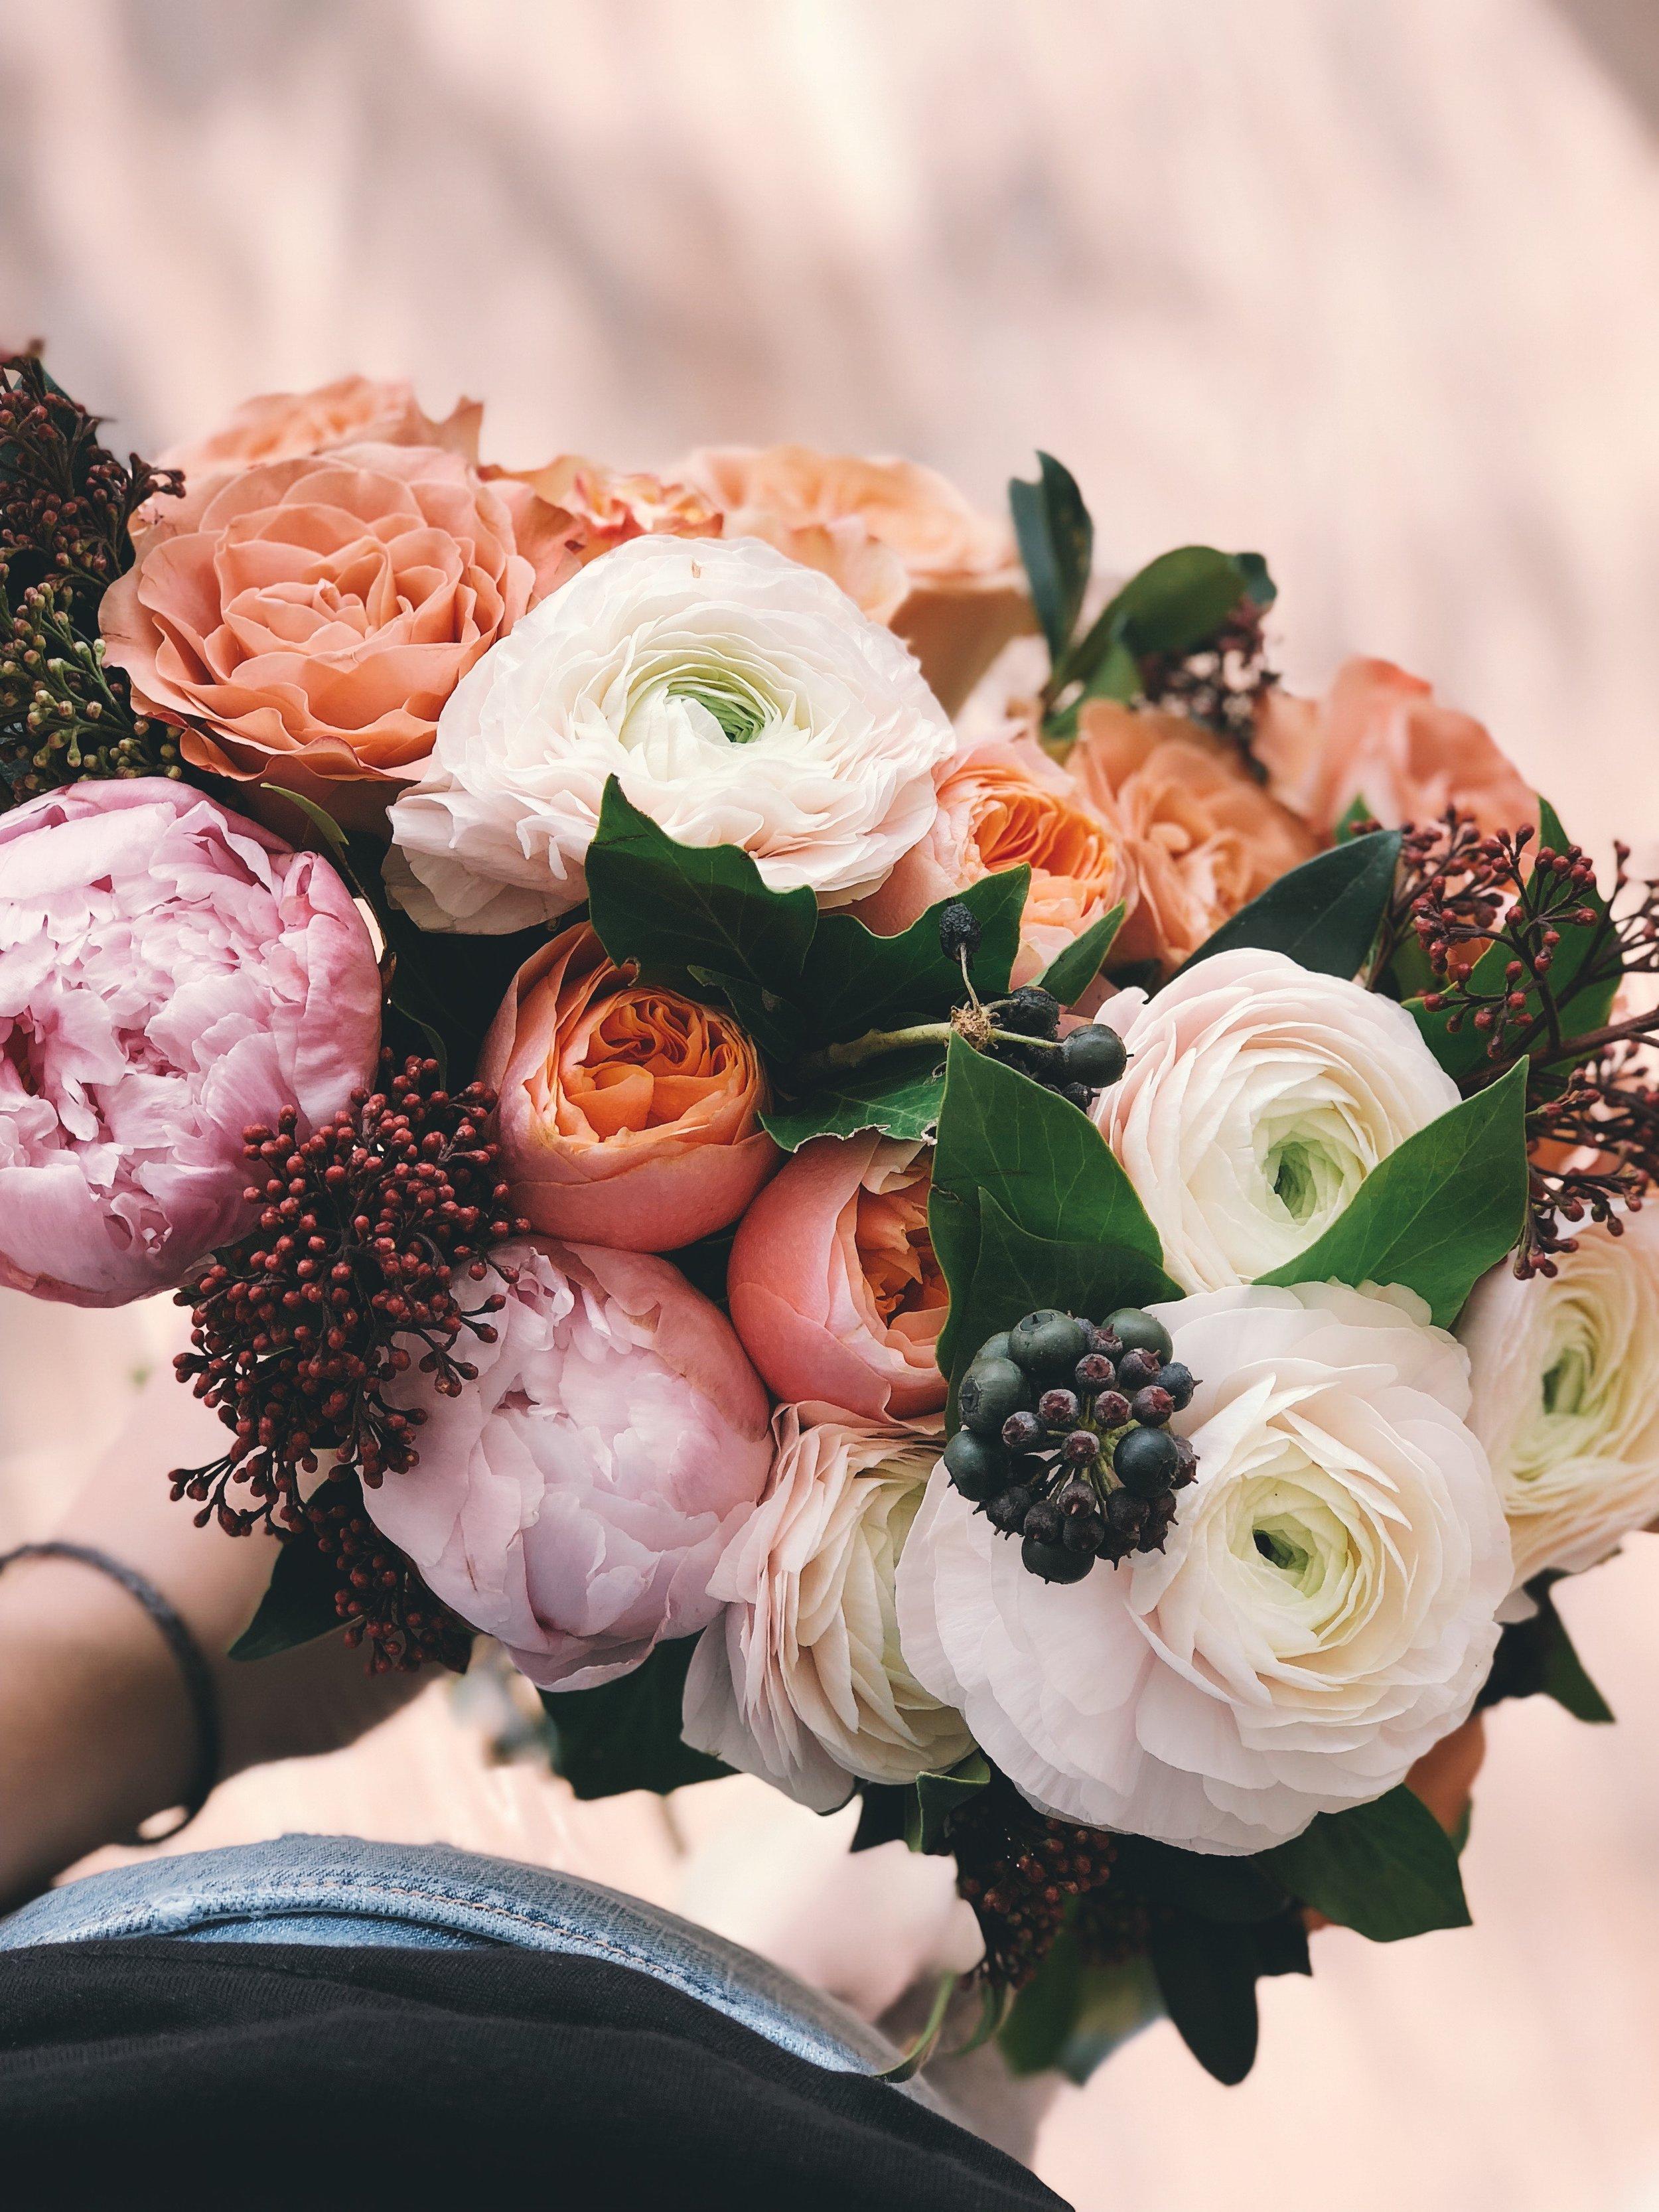 beautiful-blooming-blossom-931155.jpg